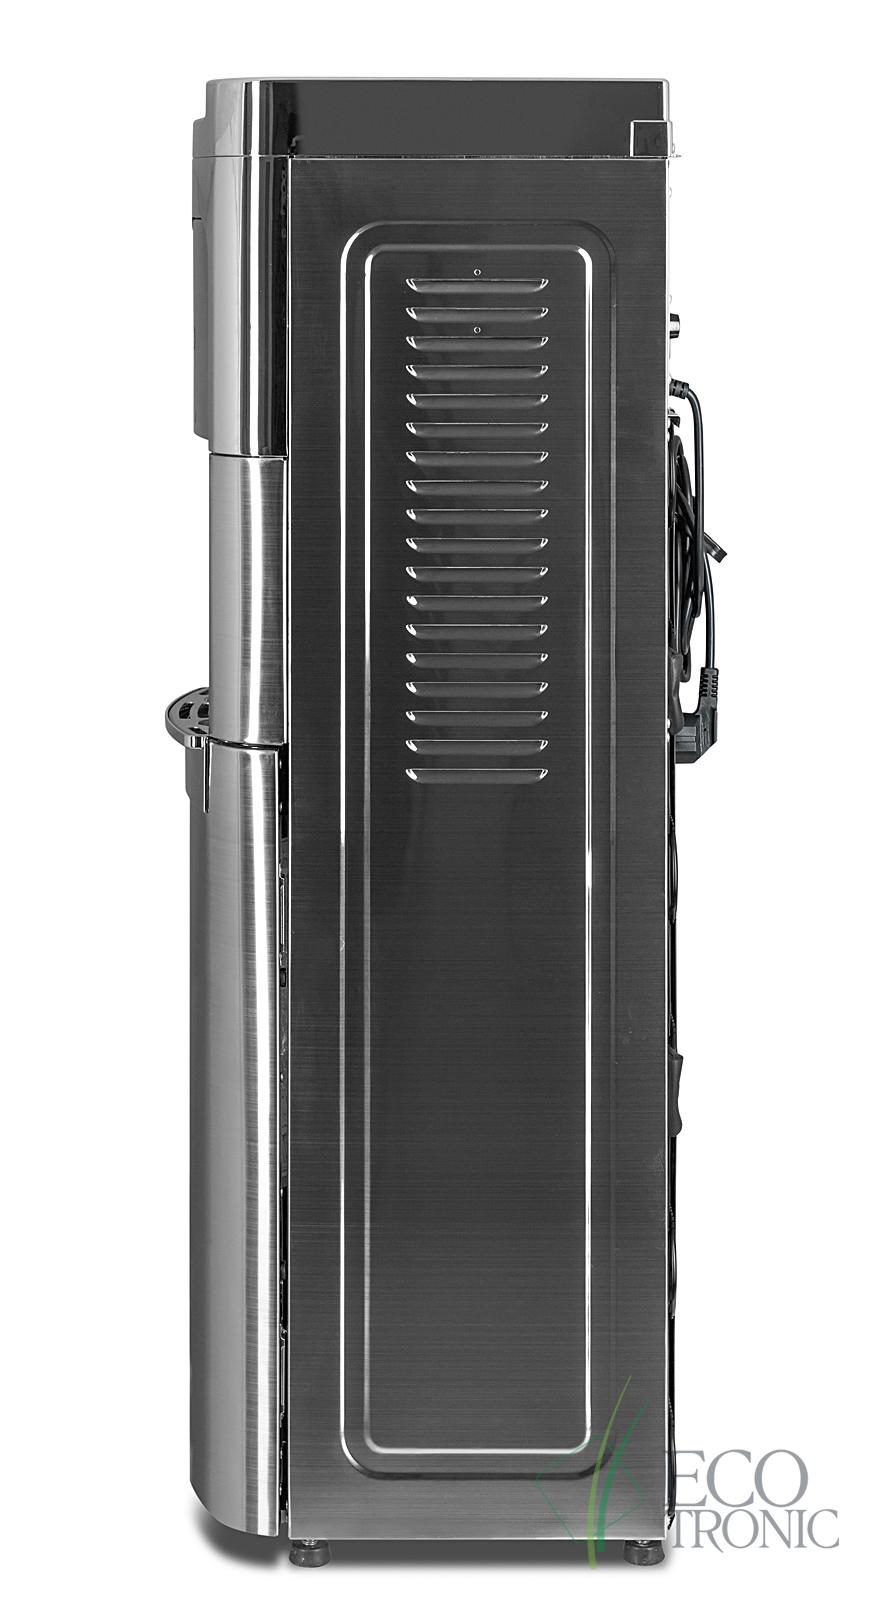 Кулер с нижней загрузкой бутыли Ecotronic C11-LXPM chrome